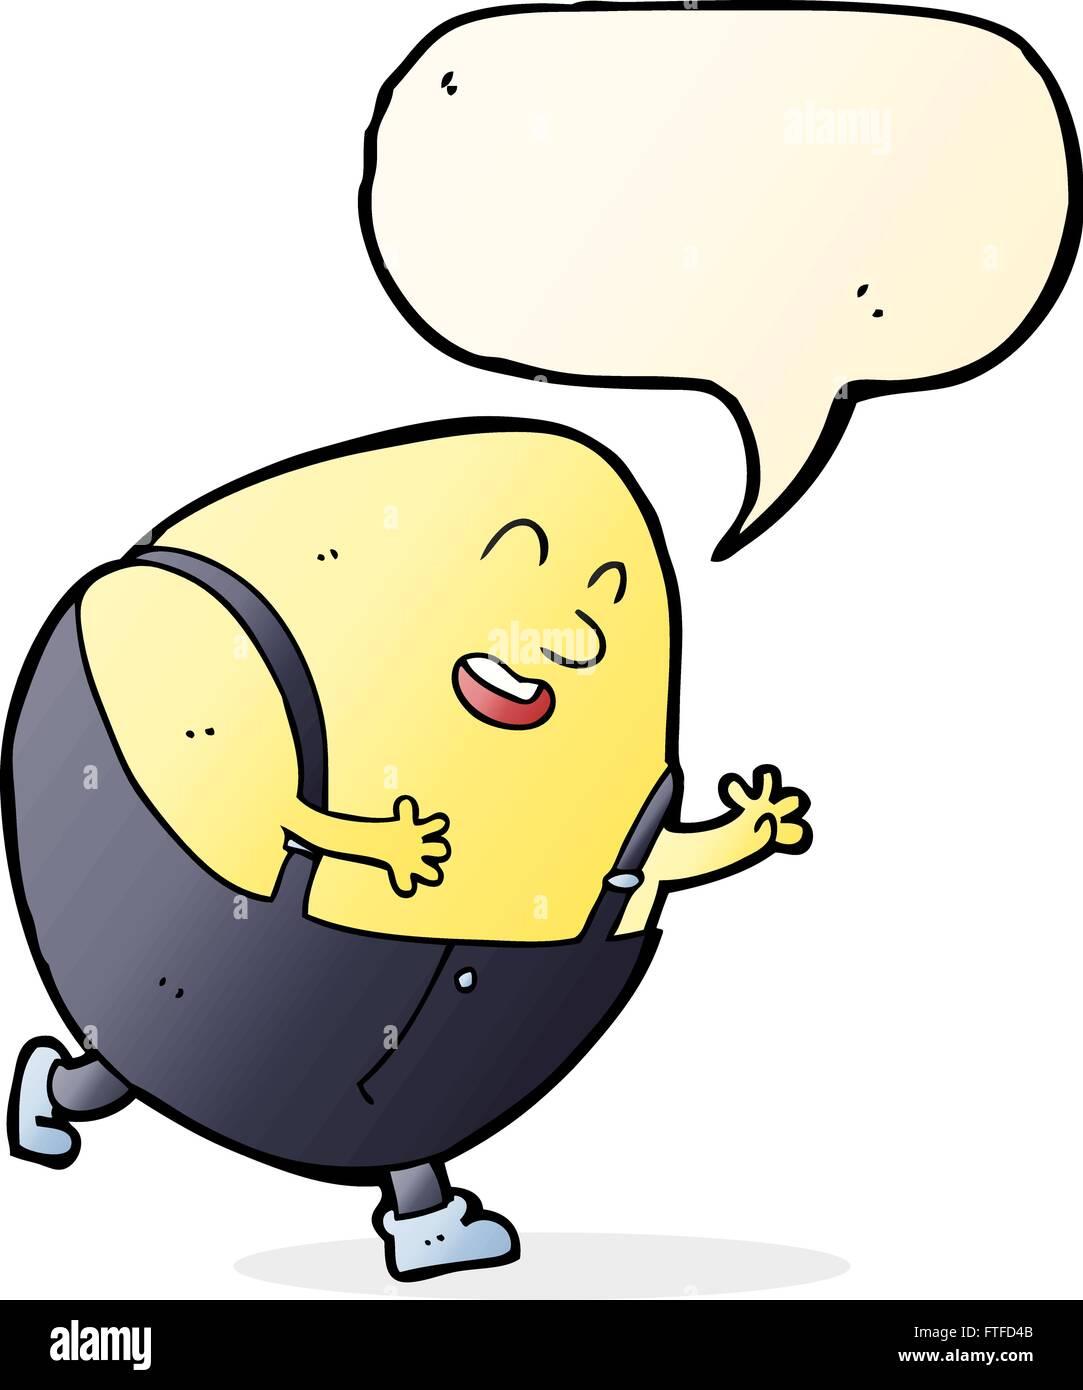 cartoon humpty dumpty egg character with speech bubble Stock Vector